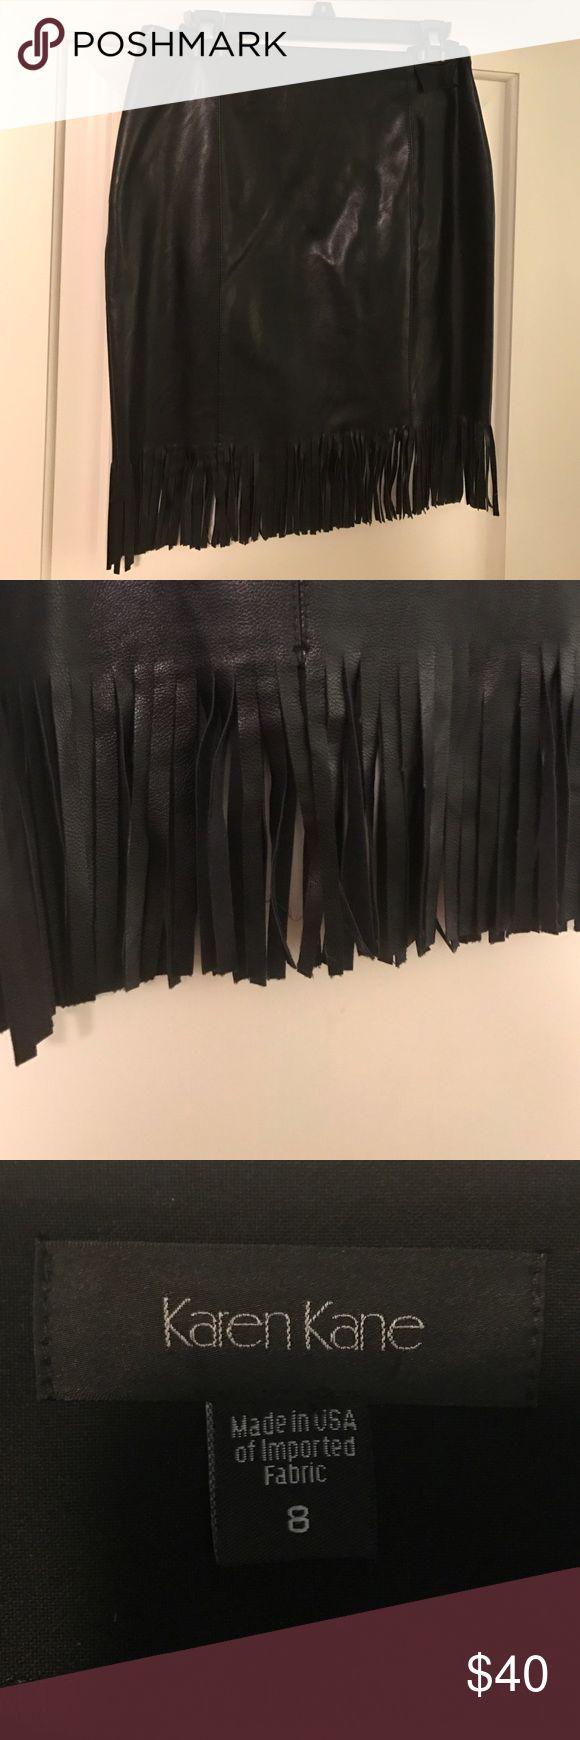 Black Karen Kane Vegan Leather Skirt Black vegan leather Karen Kane skirt with fringe bottom. Karen Kane Skirts Pencil